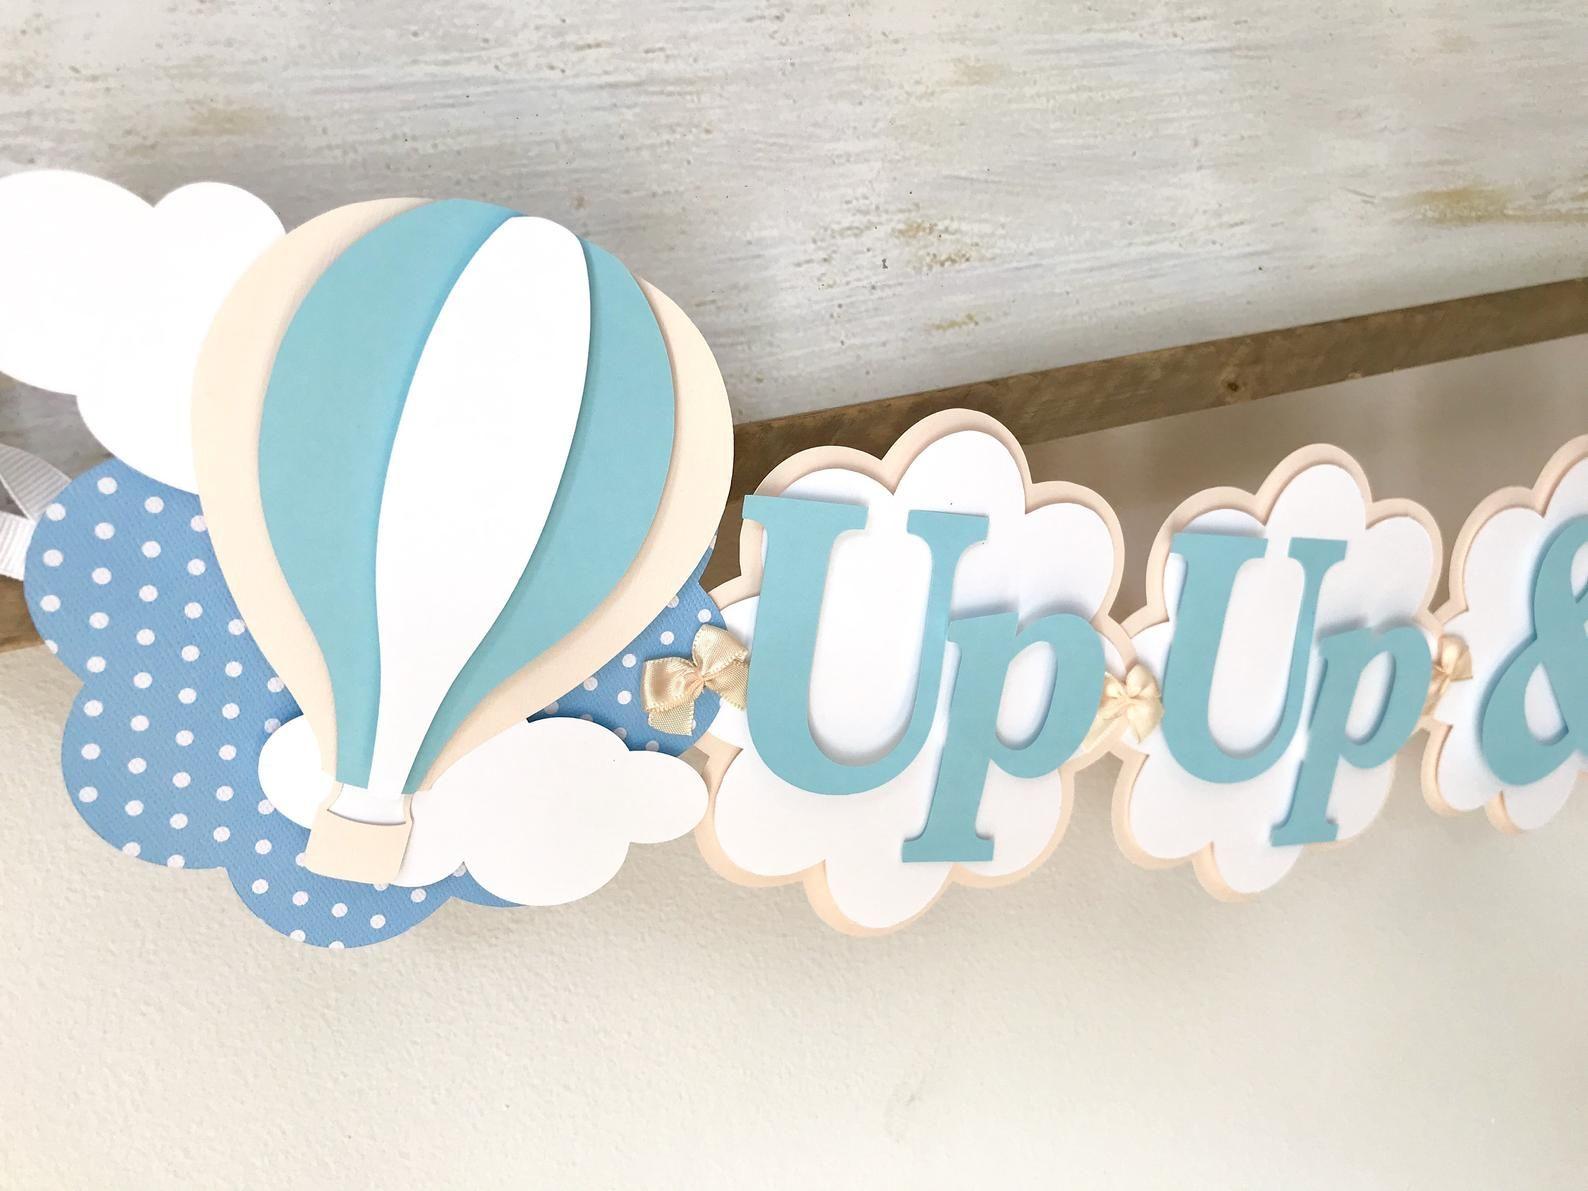 Hot Air Balloon Birthday Decorations - Hot Air Balloon Decorations - Up Up and Away